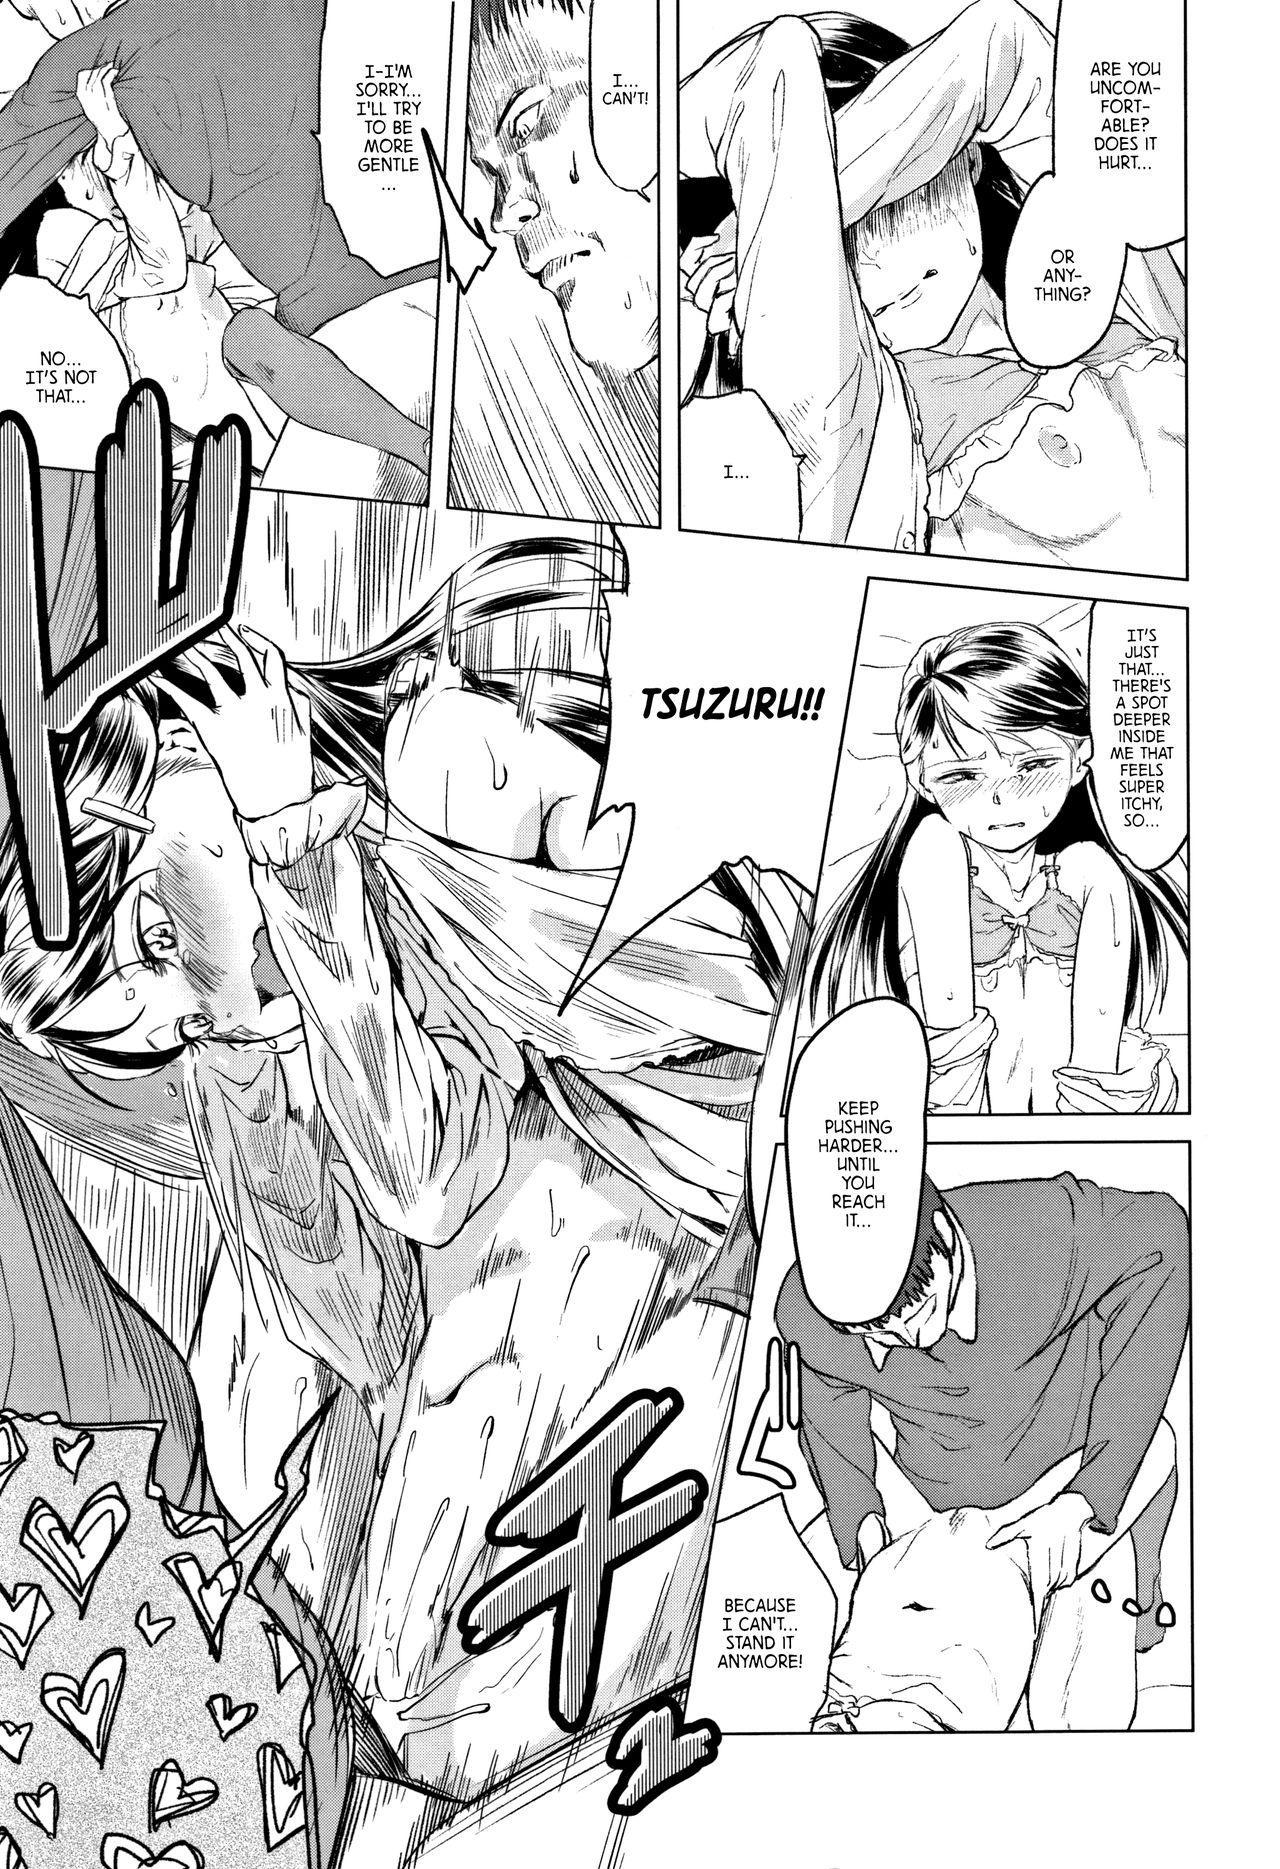 Chichi to Musume no Seiai Hakusho | Father and daughter sex white paper 206